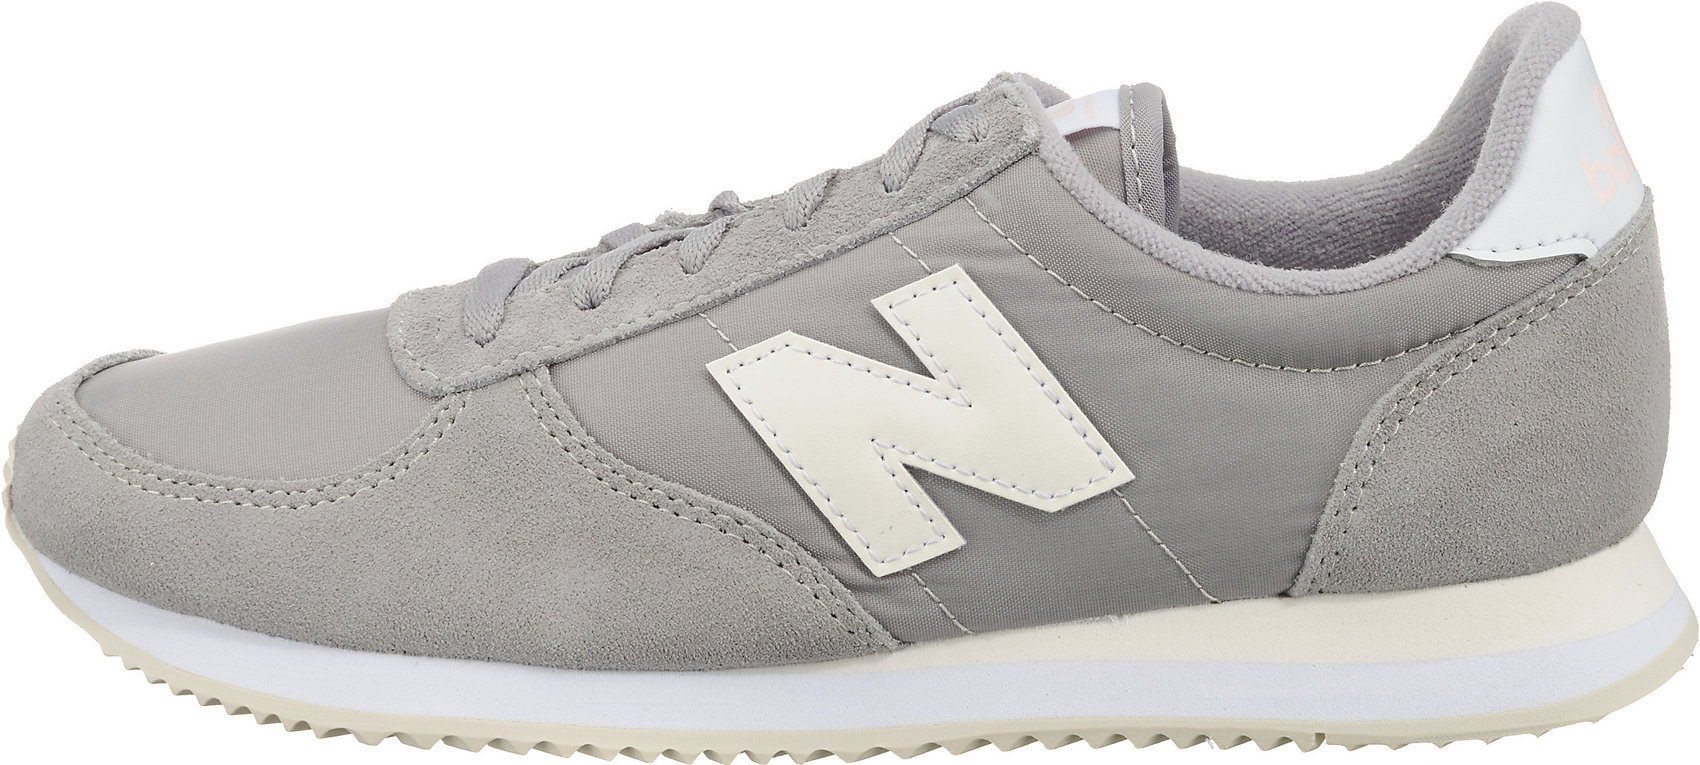 Details zu Neu new balance WL220 B Sneakers Low 7397926 für Damen grau